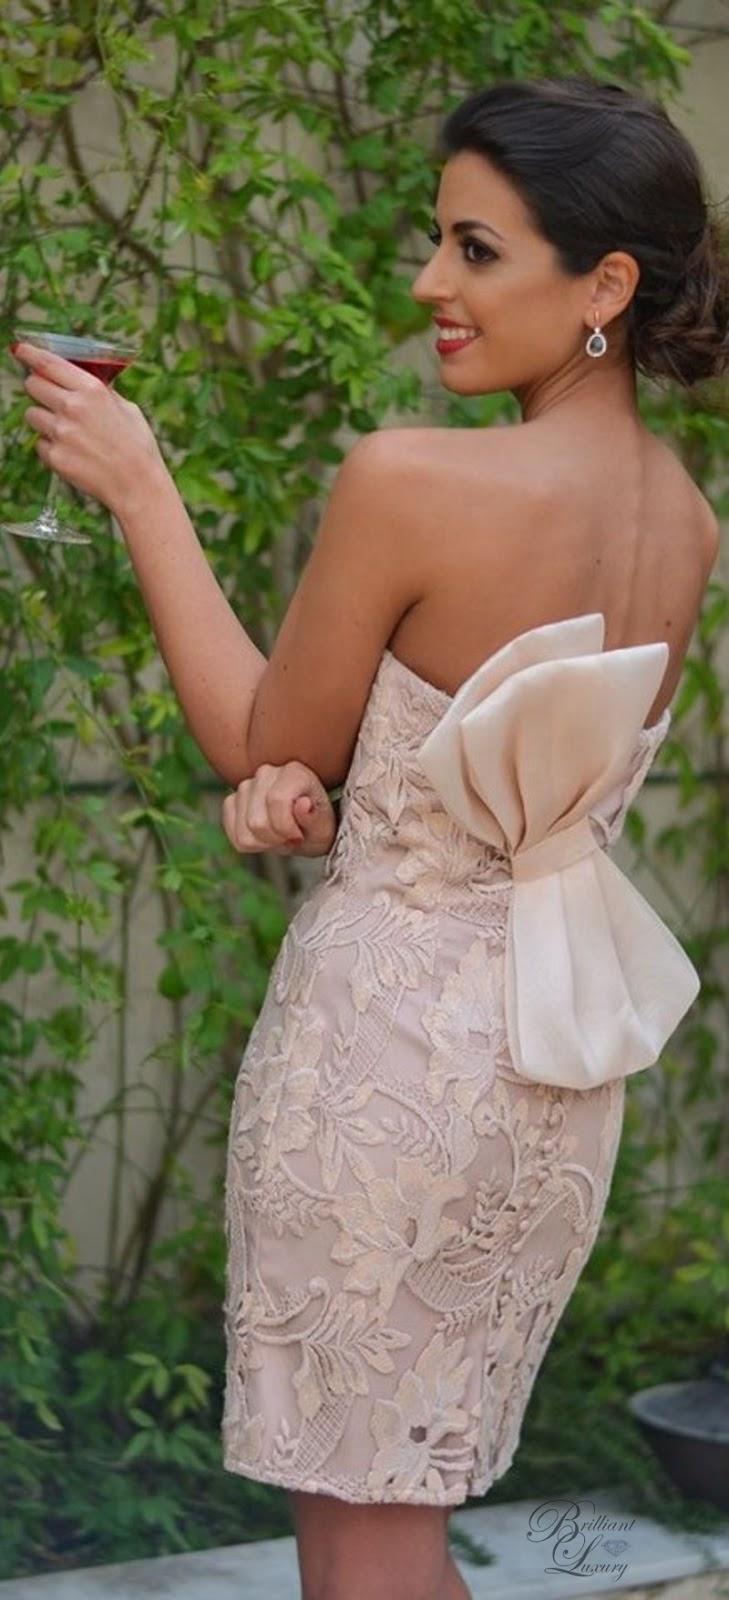 Brilliant Luxury ♦ Silvia Navarro Dalia dress with bow details